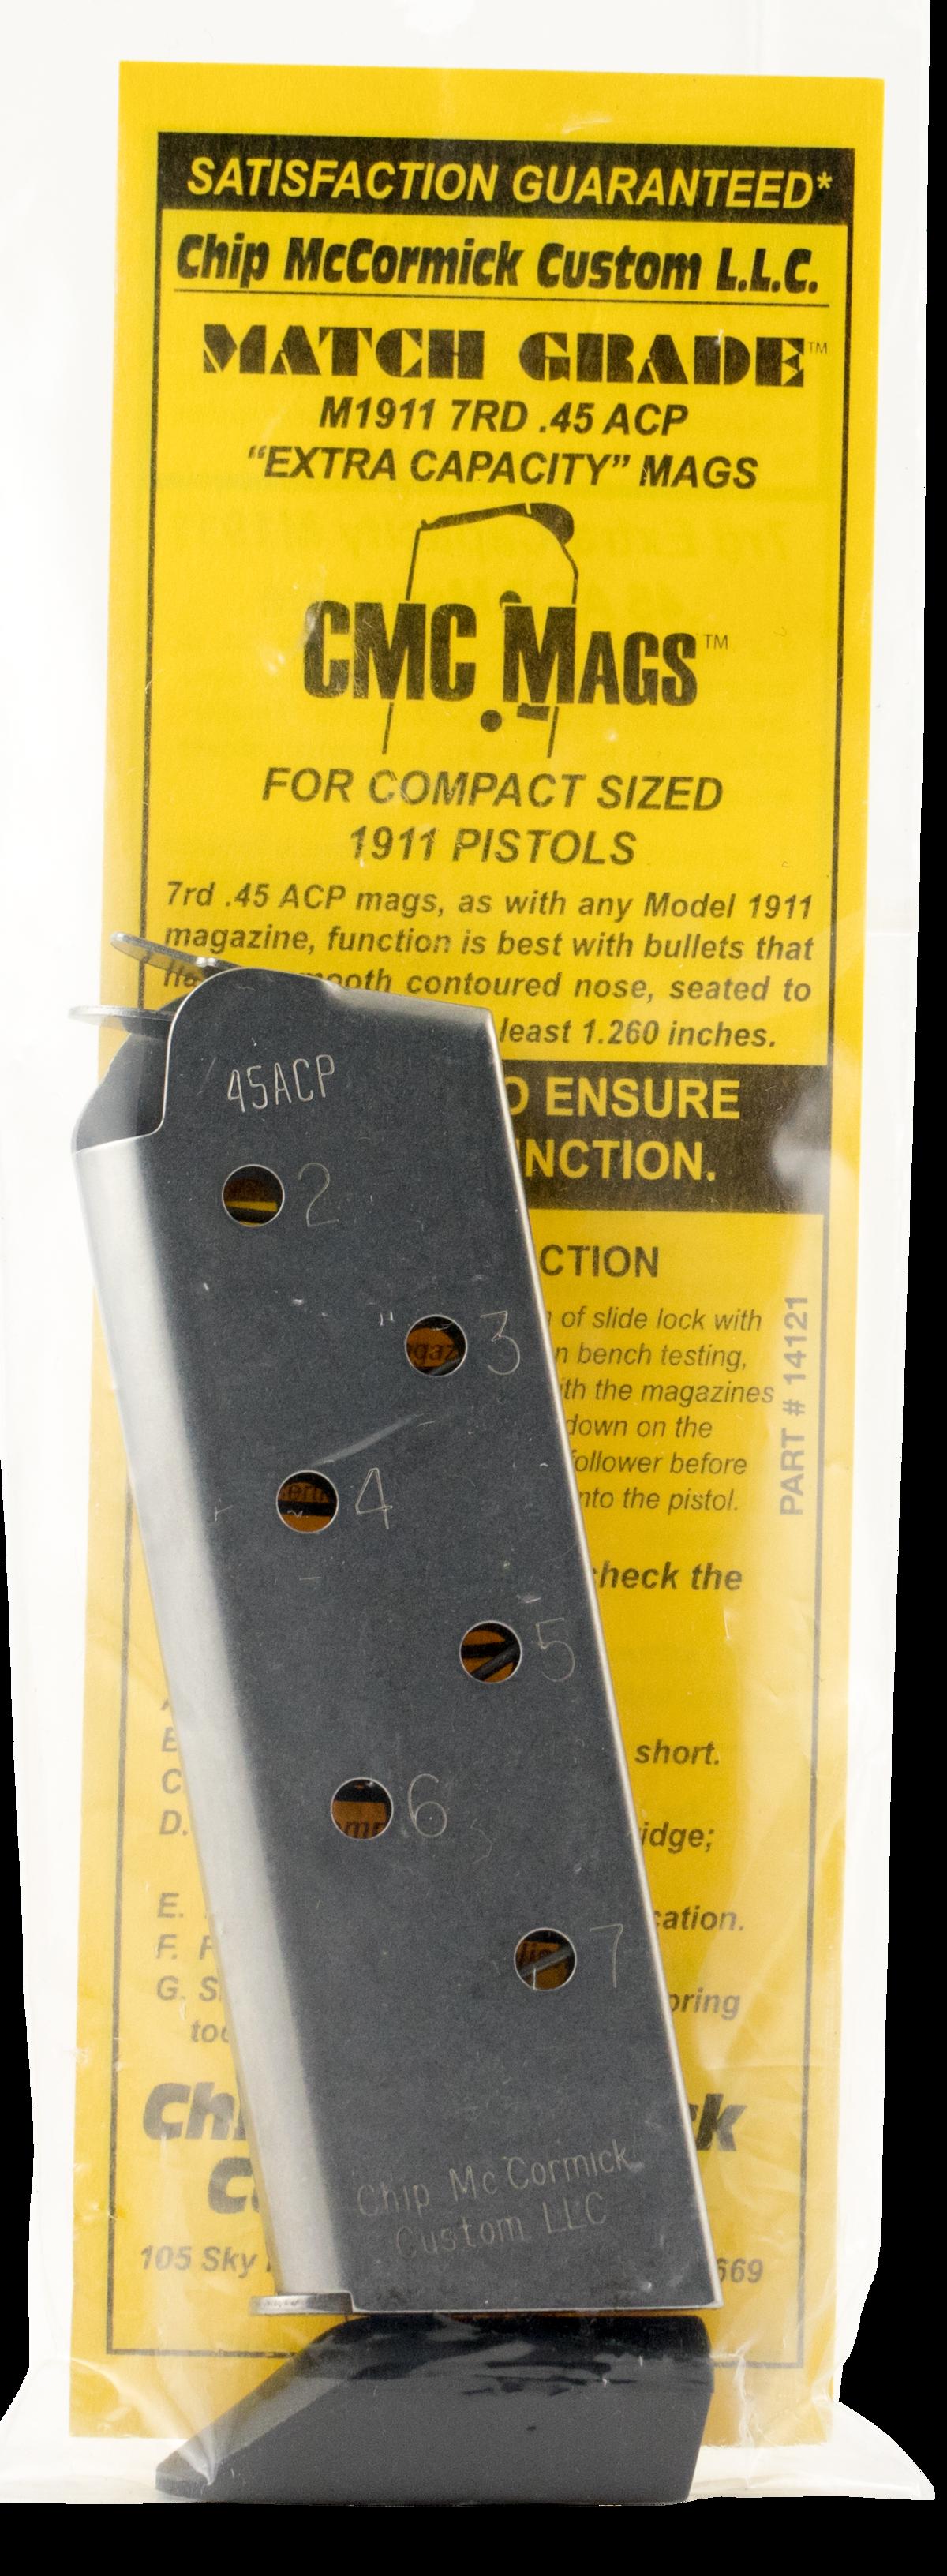 CHIP MCCORMICK CUSTOM 1911 MATCH GRADE